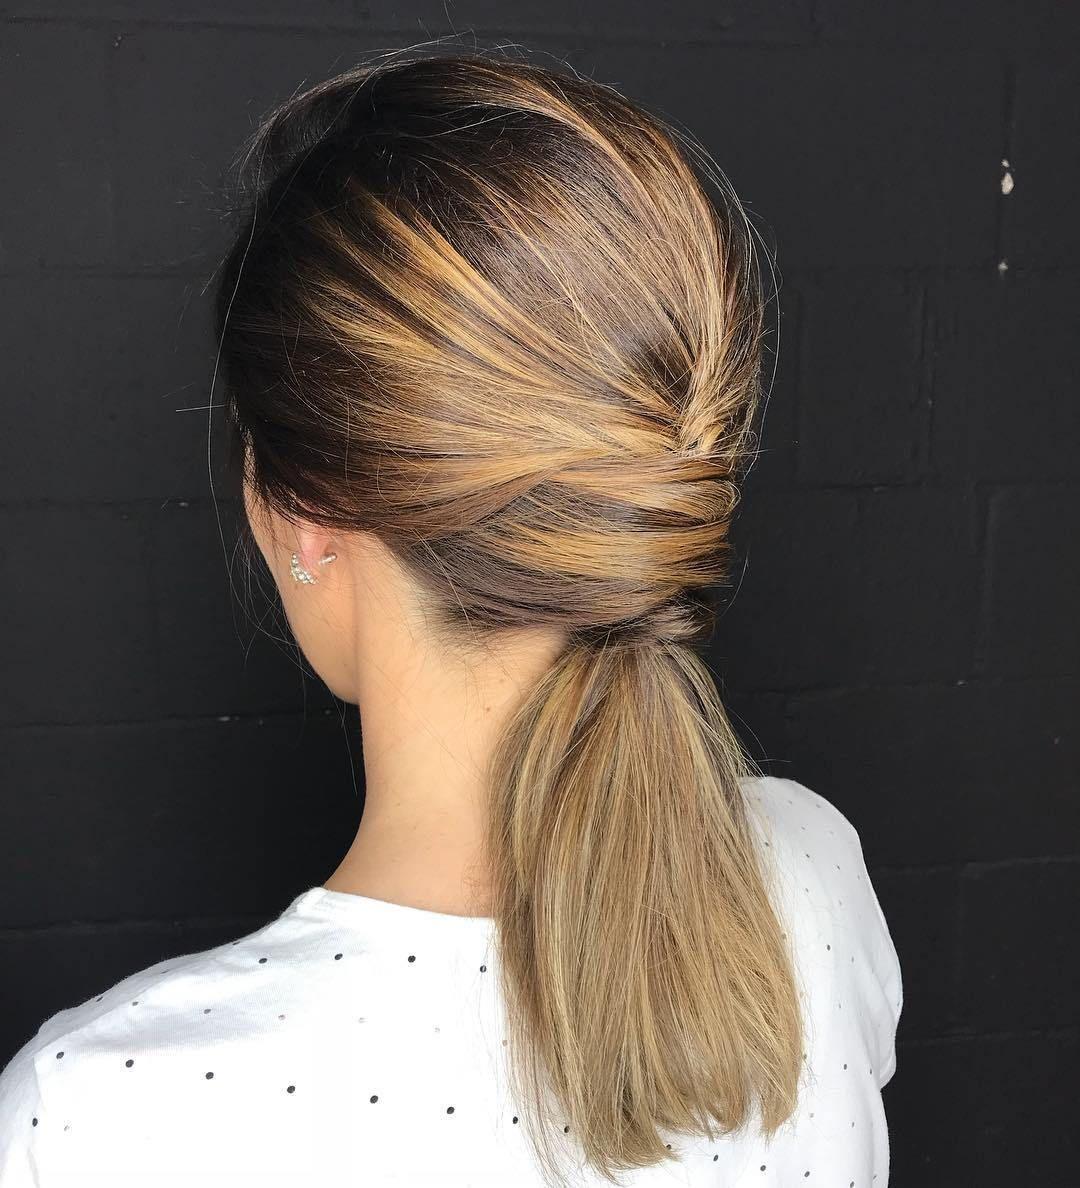 60 Trendiest Updos For Medium Length Hair Updos For Medium Length Hair Hair Lengths Up Dos For Medium Hair